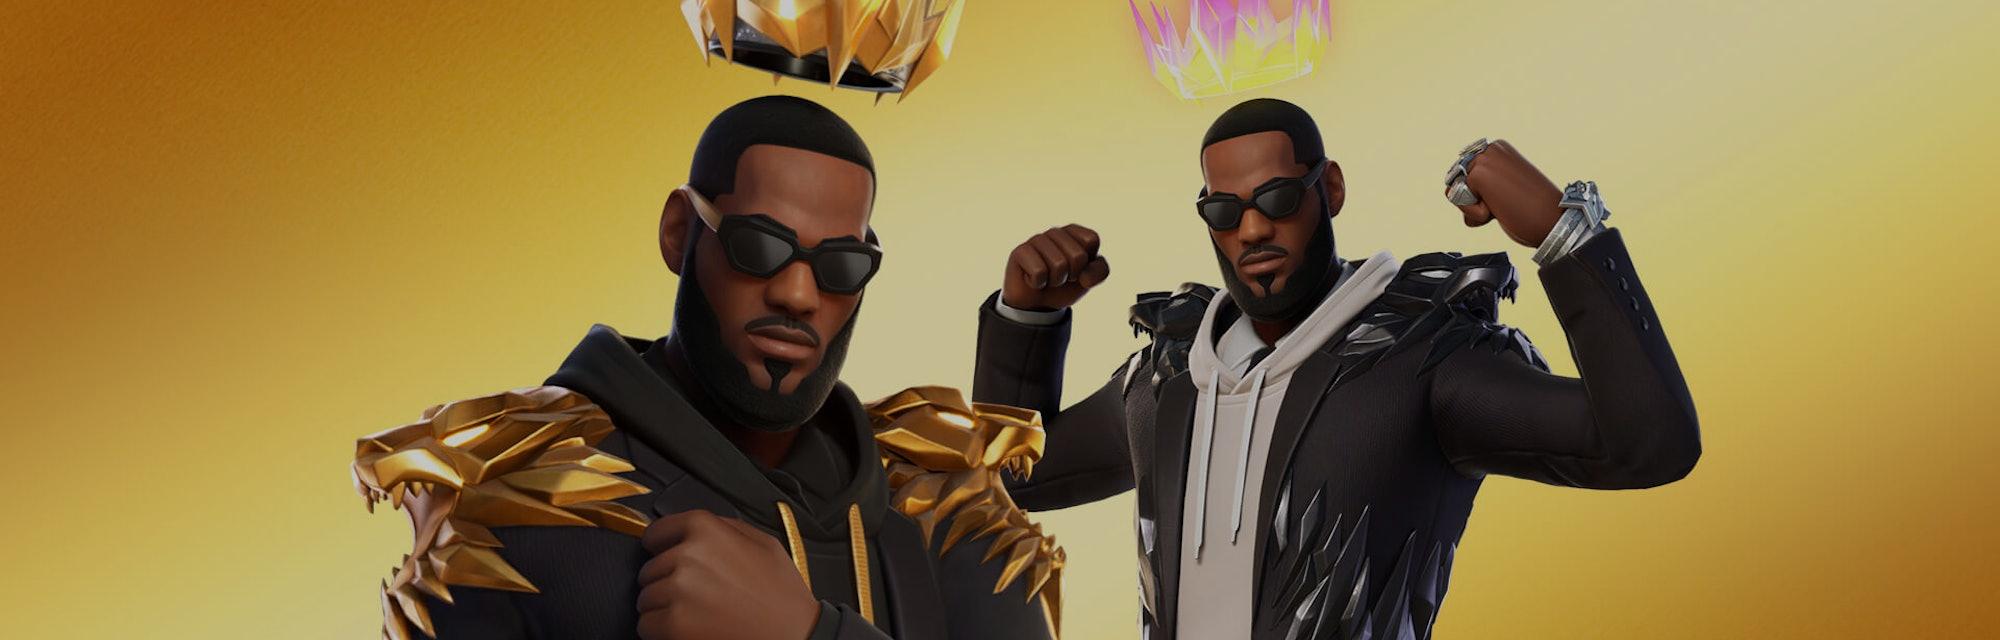 LeBron James Fortnite skins promo art from Epic Games